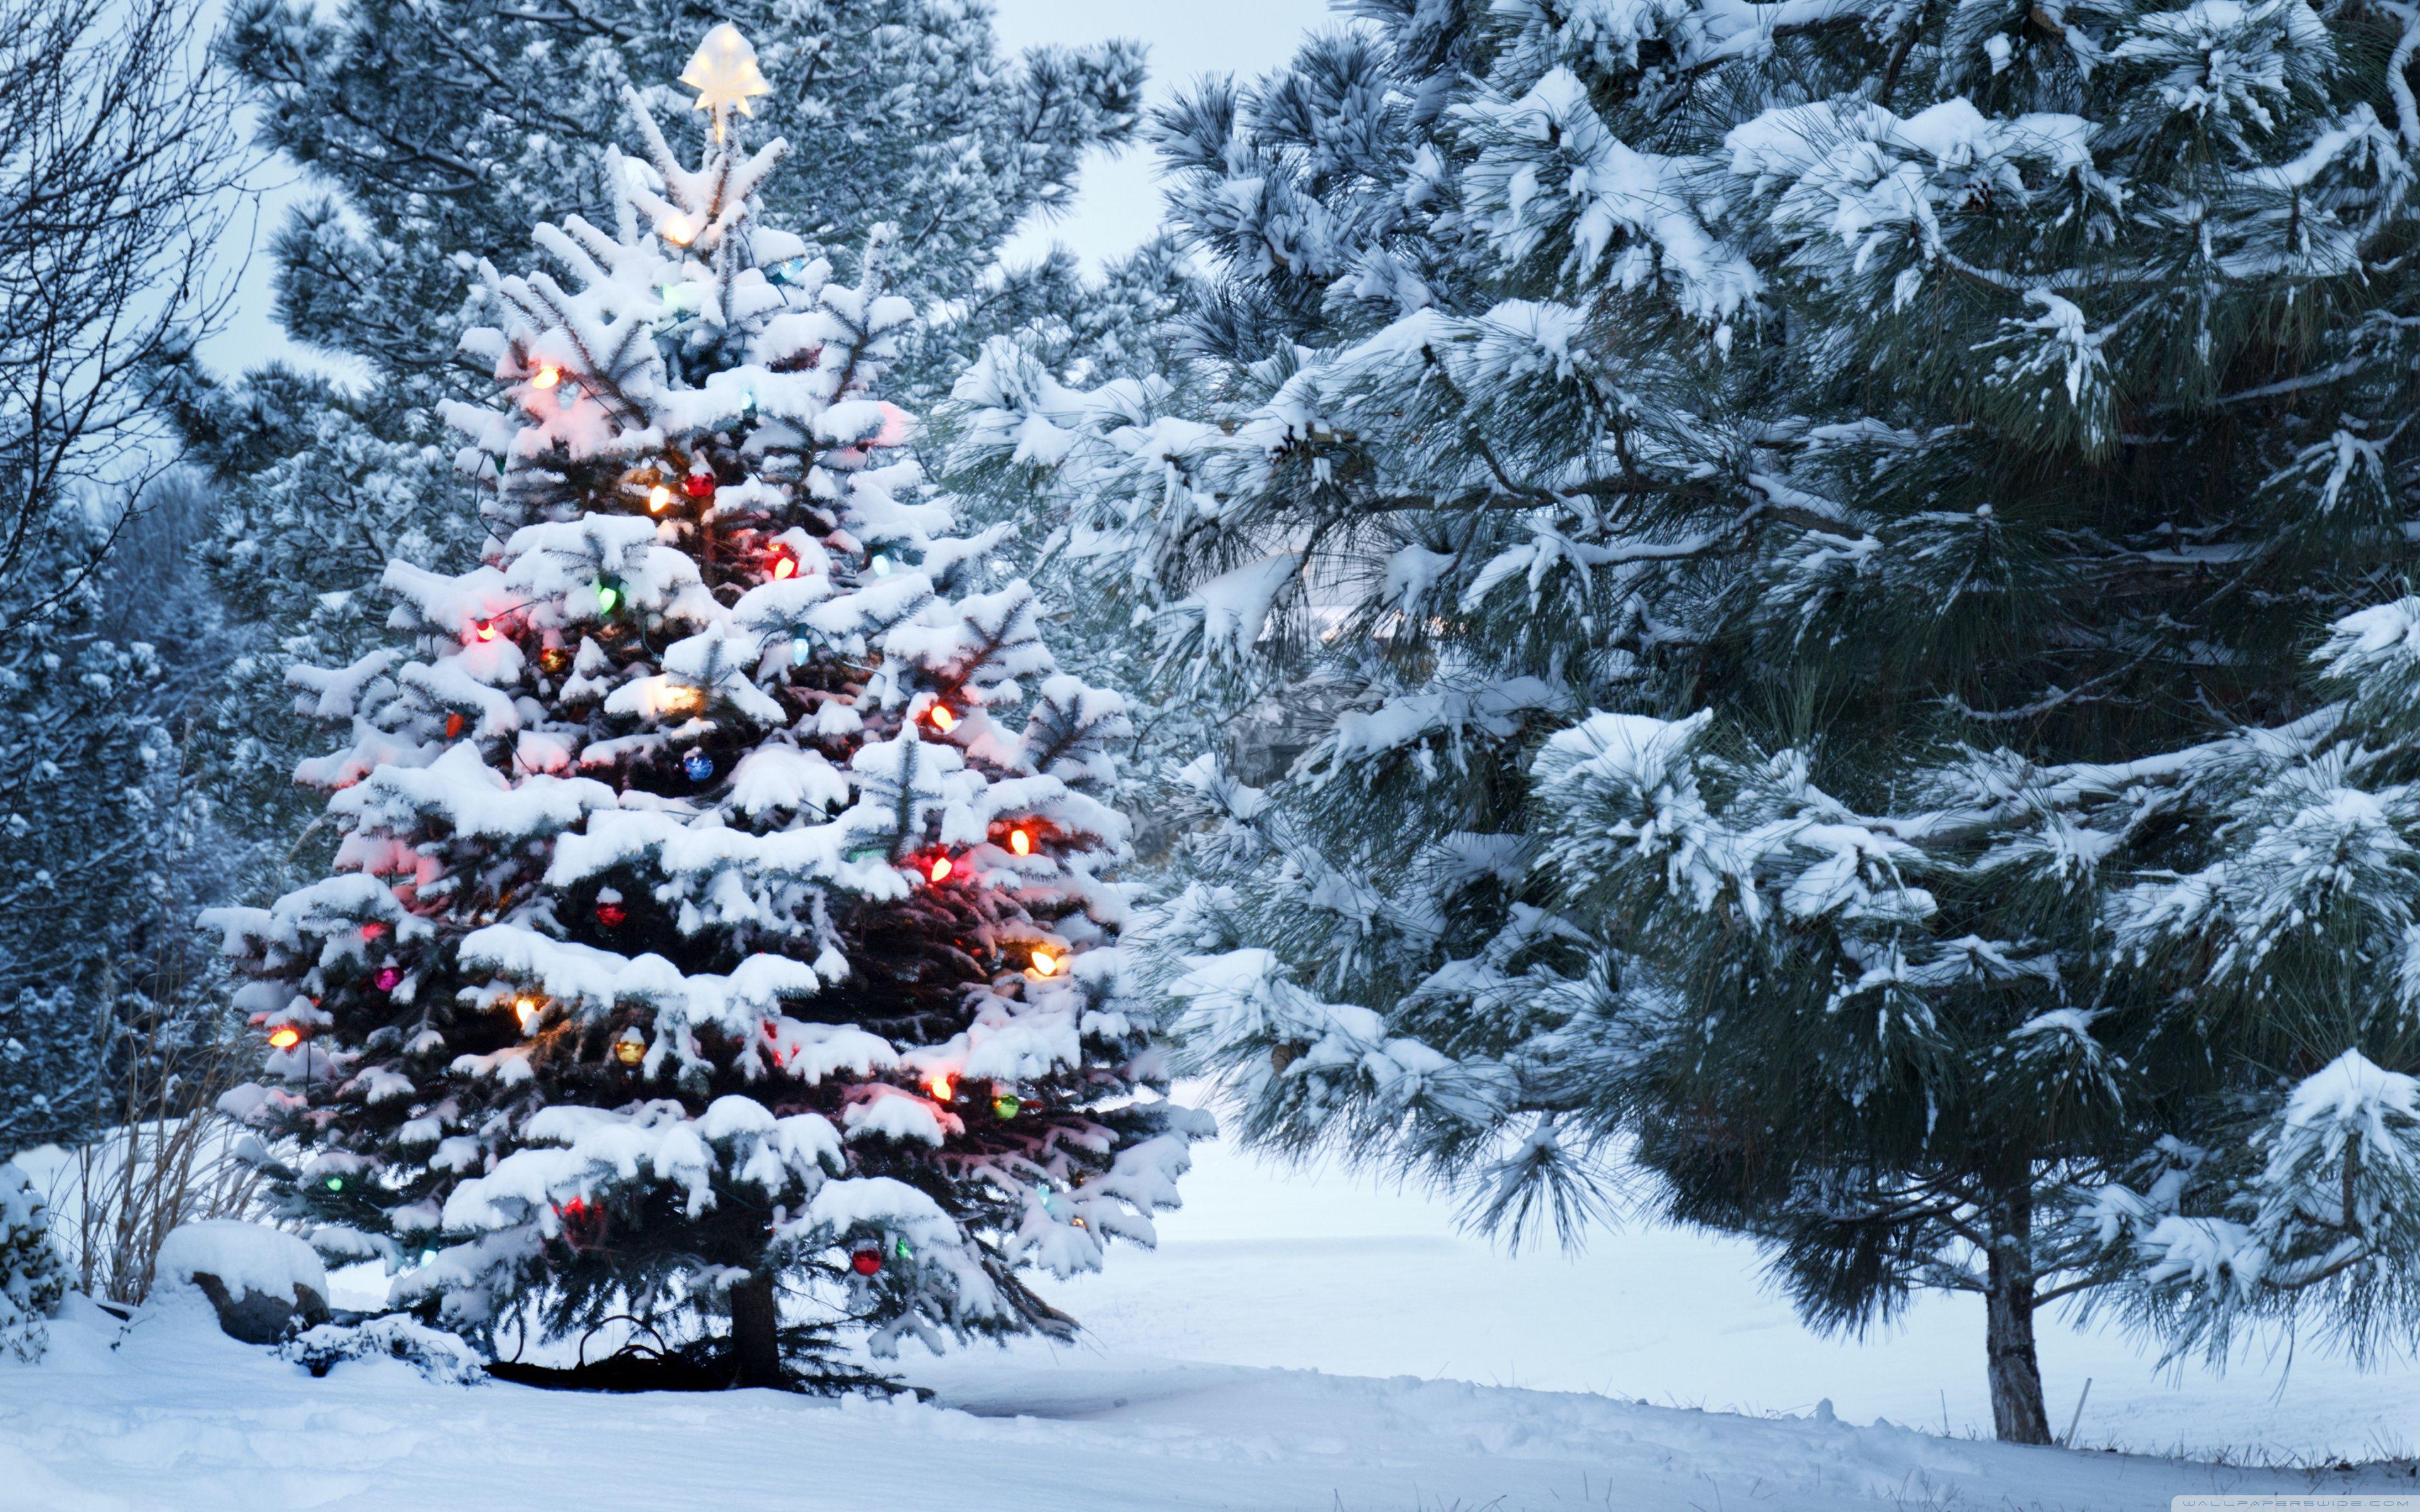 Pin By Semuel On Christmas Christmas Tree Wallpaper Snow Covered Christmas Trees Outdoor Christmas Tree